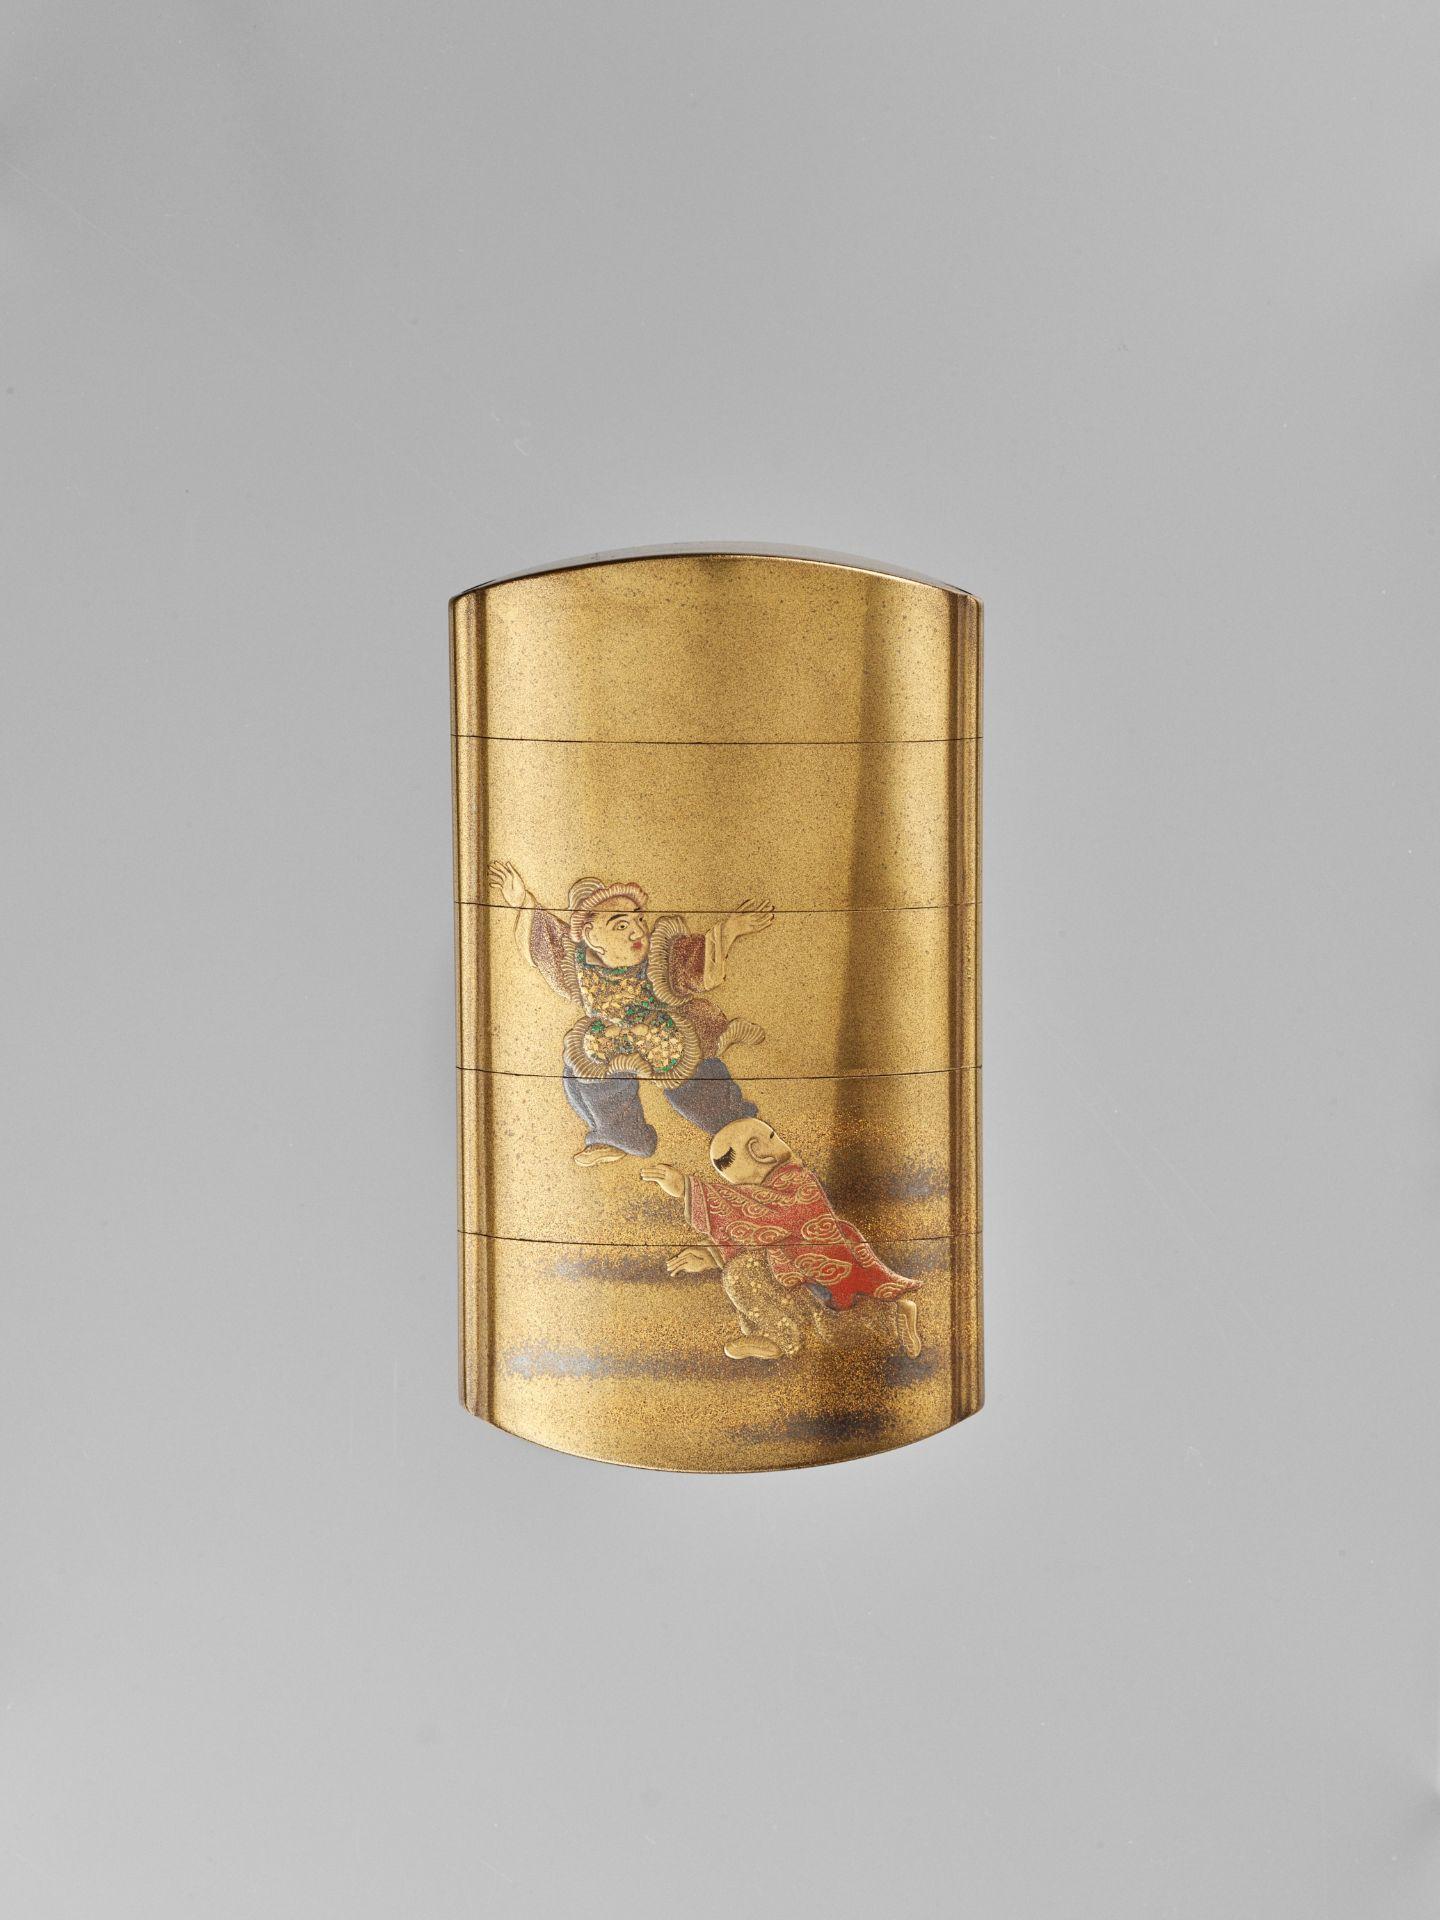 JOKASAI: A FINE GOLD LACQUER FOUR-CASE INRO DEPICTING SHIBA ONKO - Image 4 of 5